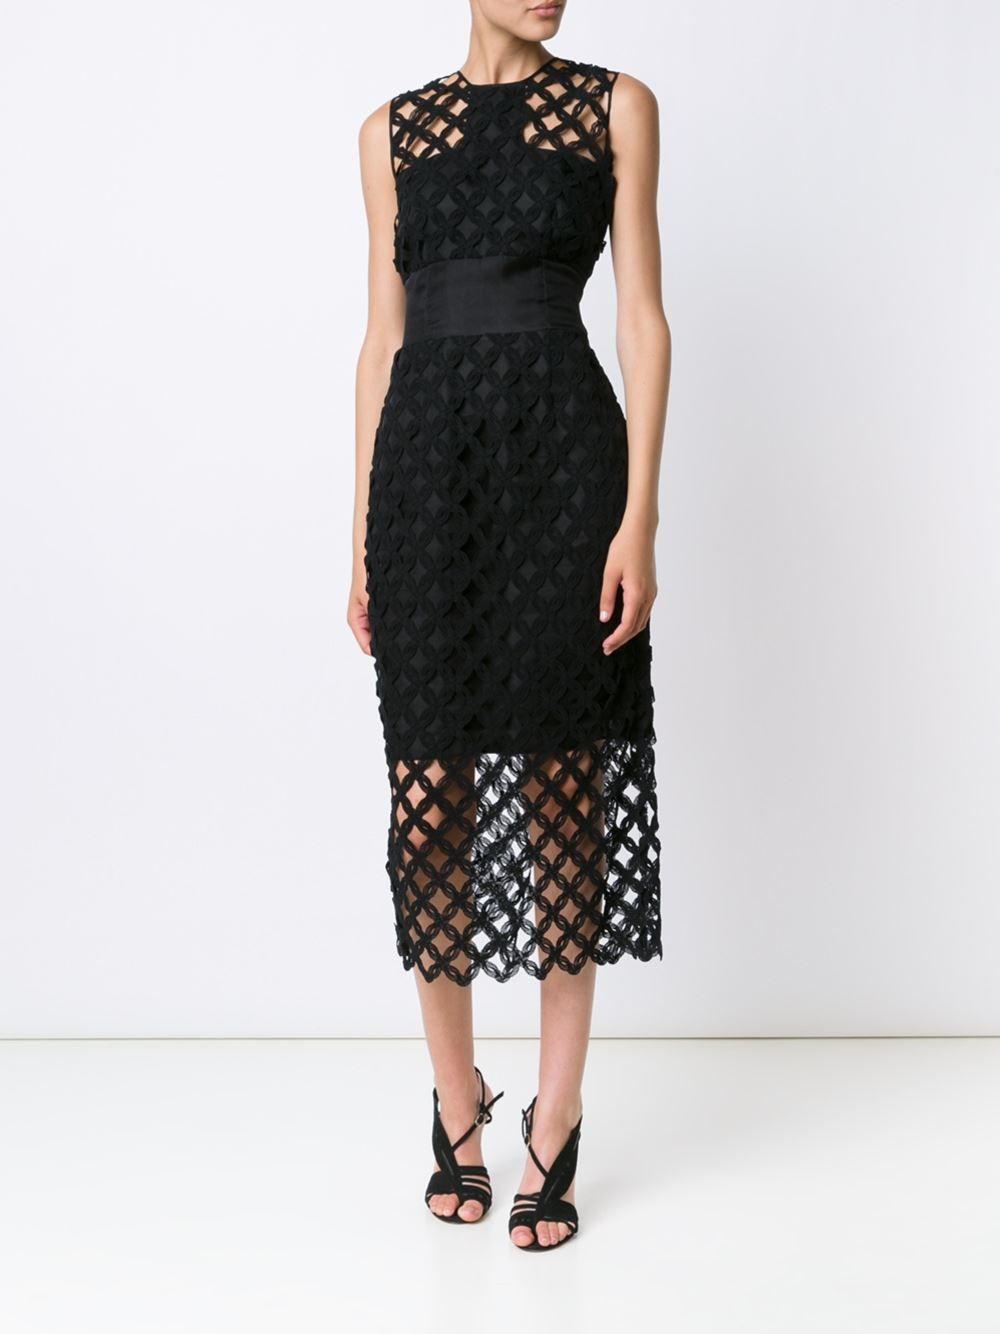 Lace short dress styles in nigeria  Sophie Theallet Vestido com detalhe de renda  Vestidos  Pinterest